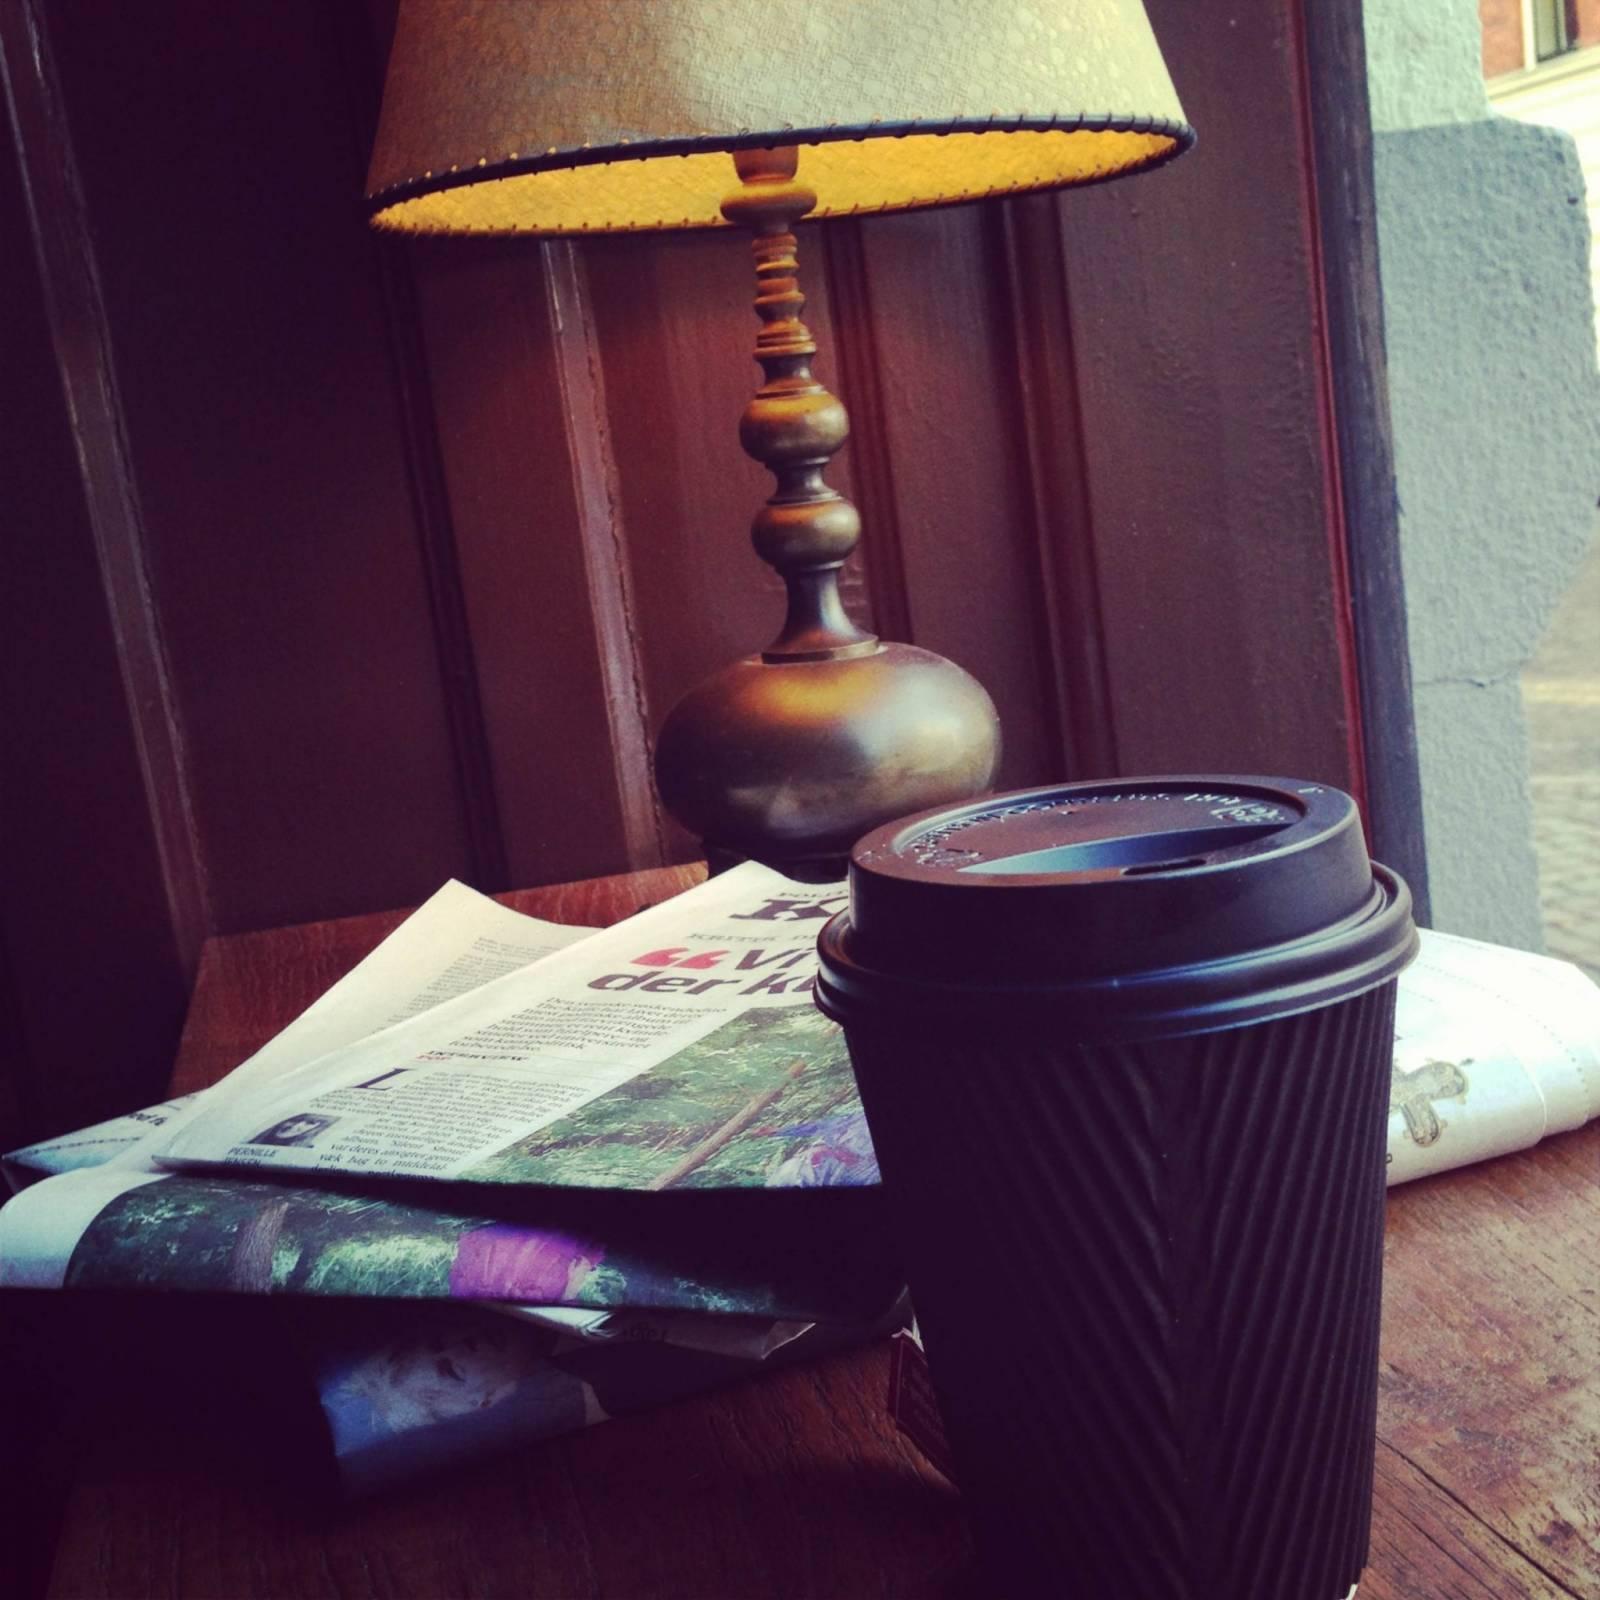 I kampen om vores tid ender papiravisen som en luksusvare